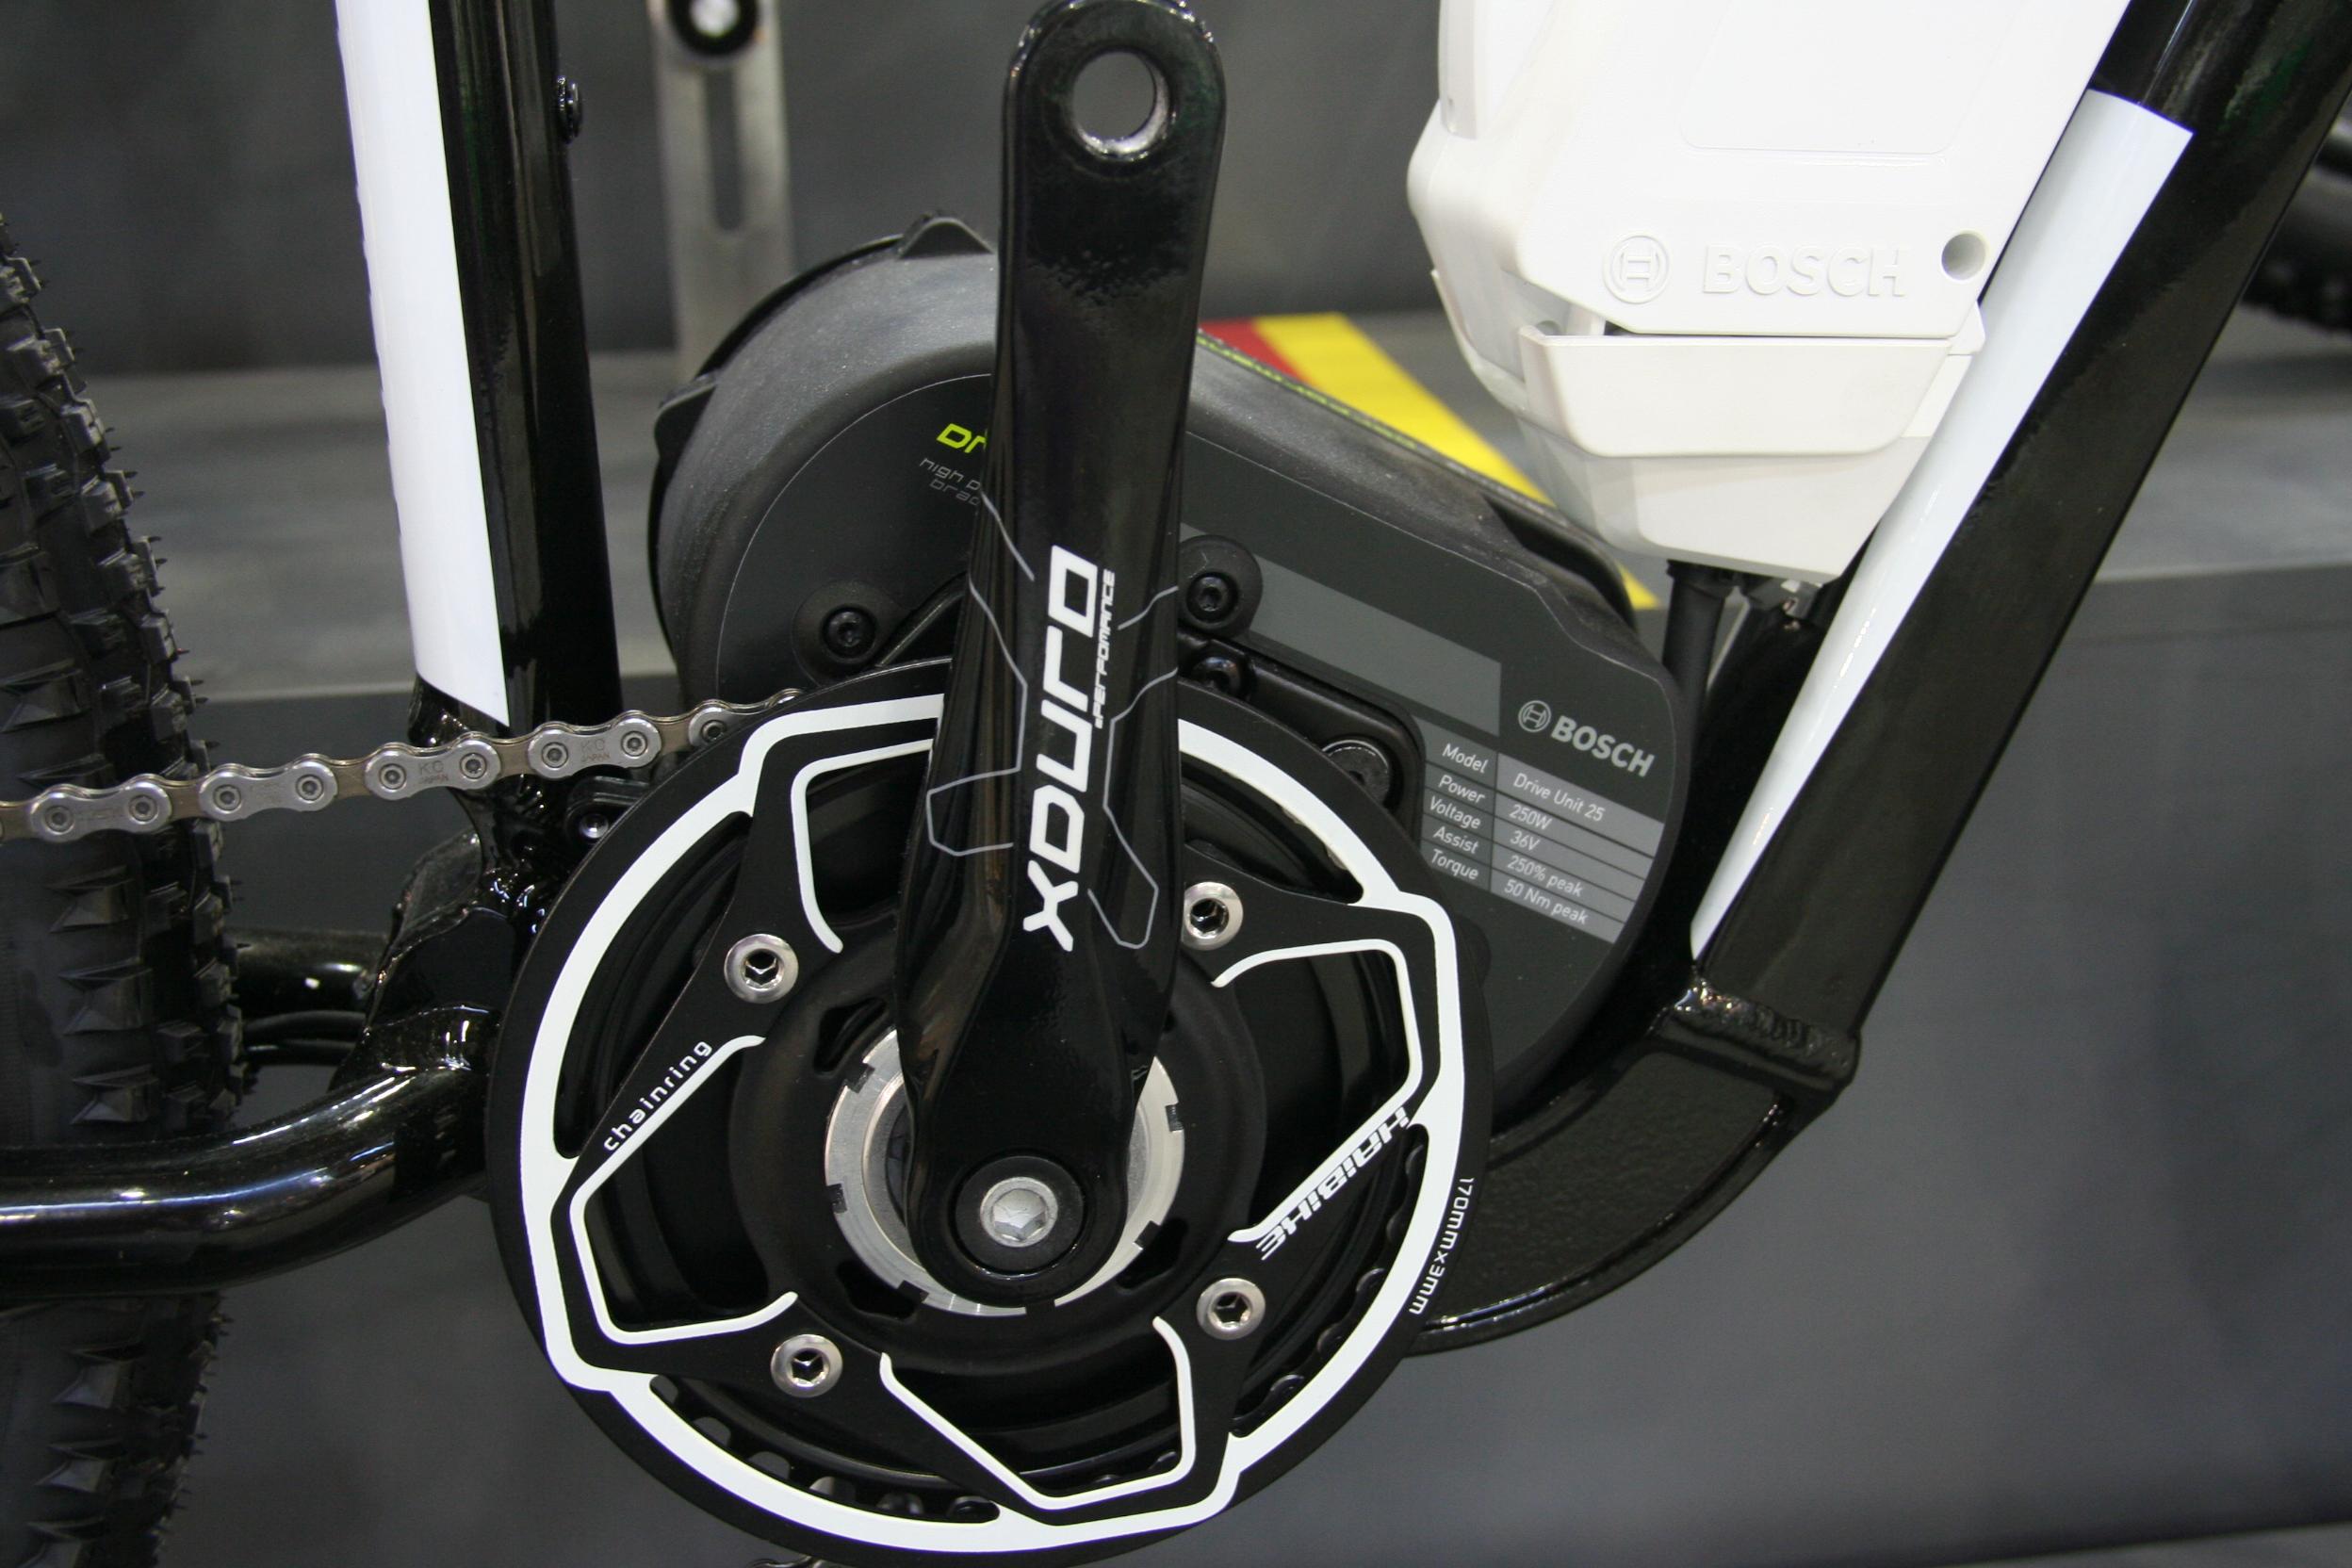 Schema Elettrico Bici Pedalata Assistita : Bici a pedalata assistita attenti ai sensori veicoli